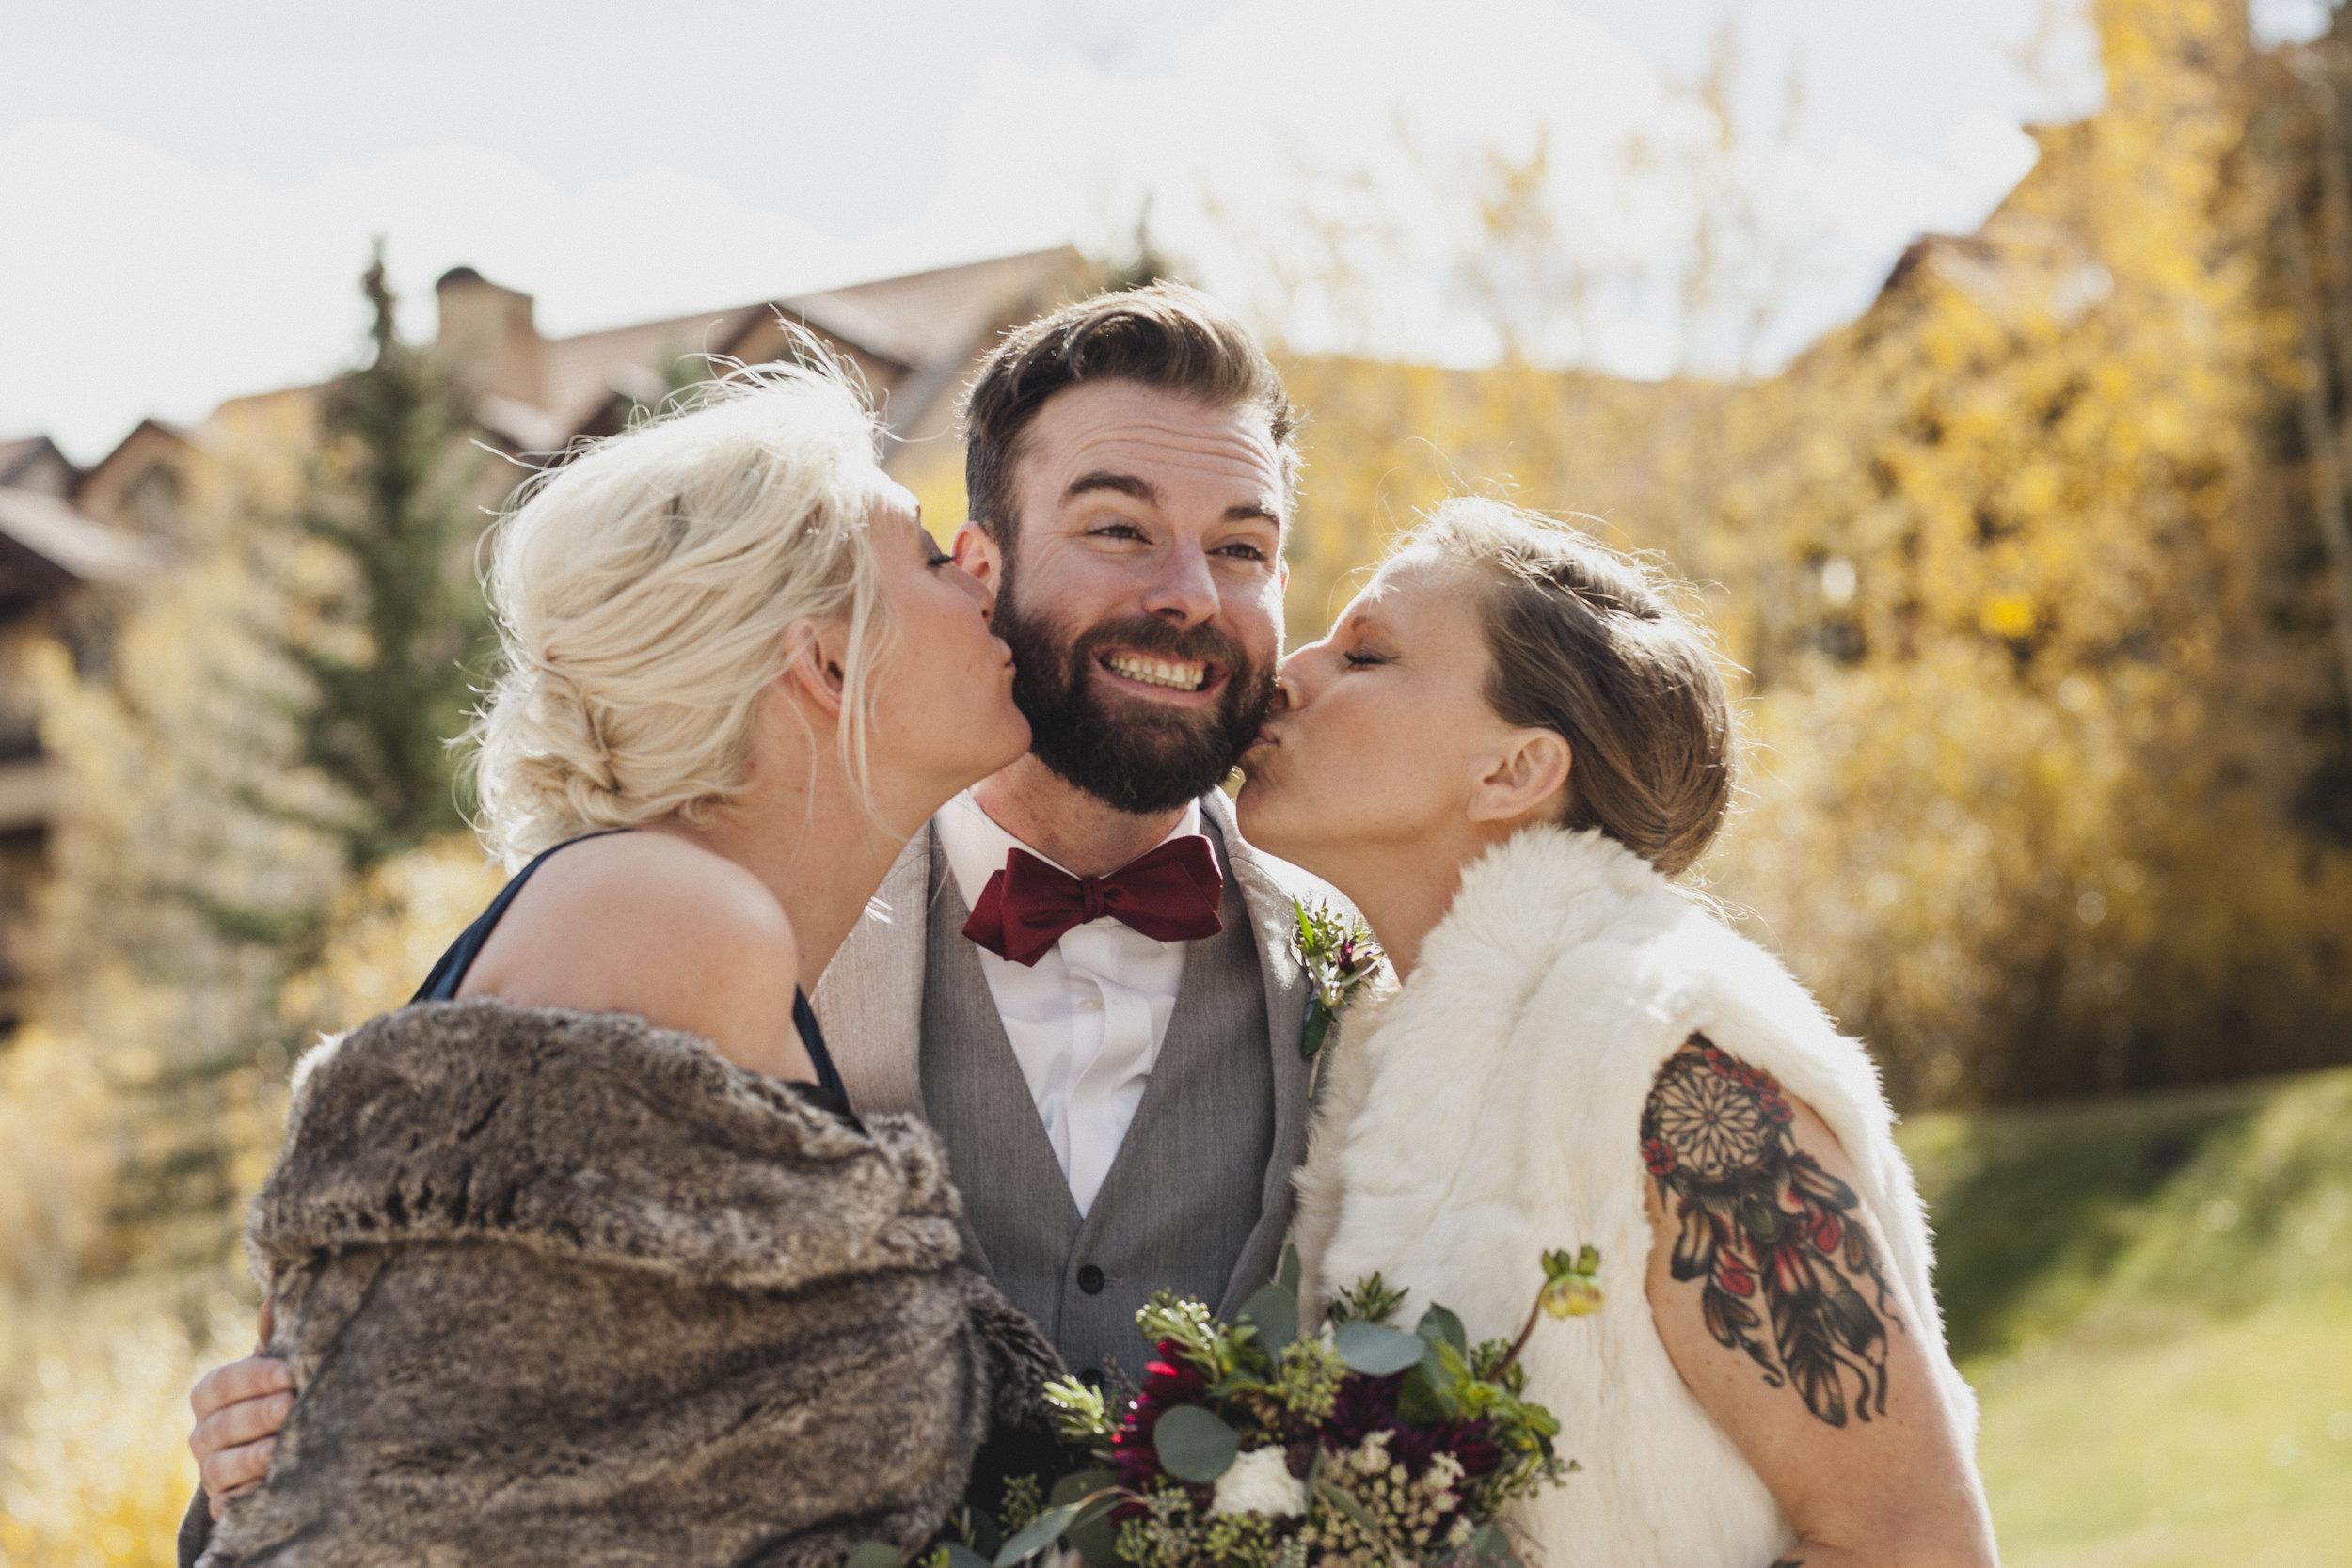 NE-LeahandAshtonphotography-Telluride-Wedding-Photography-7091.jpg